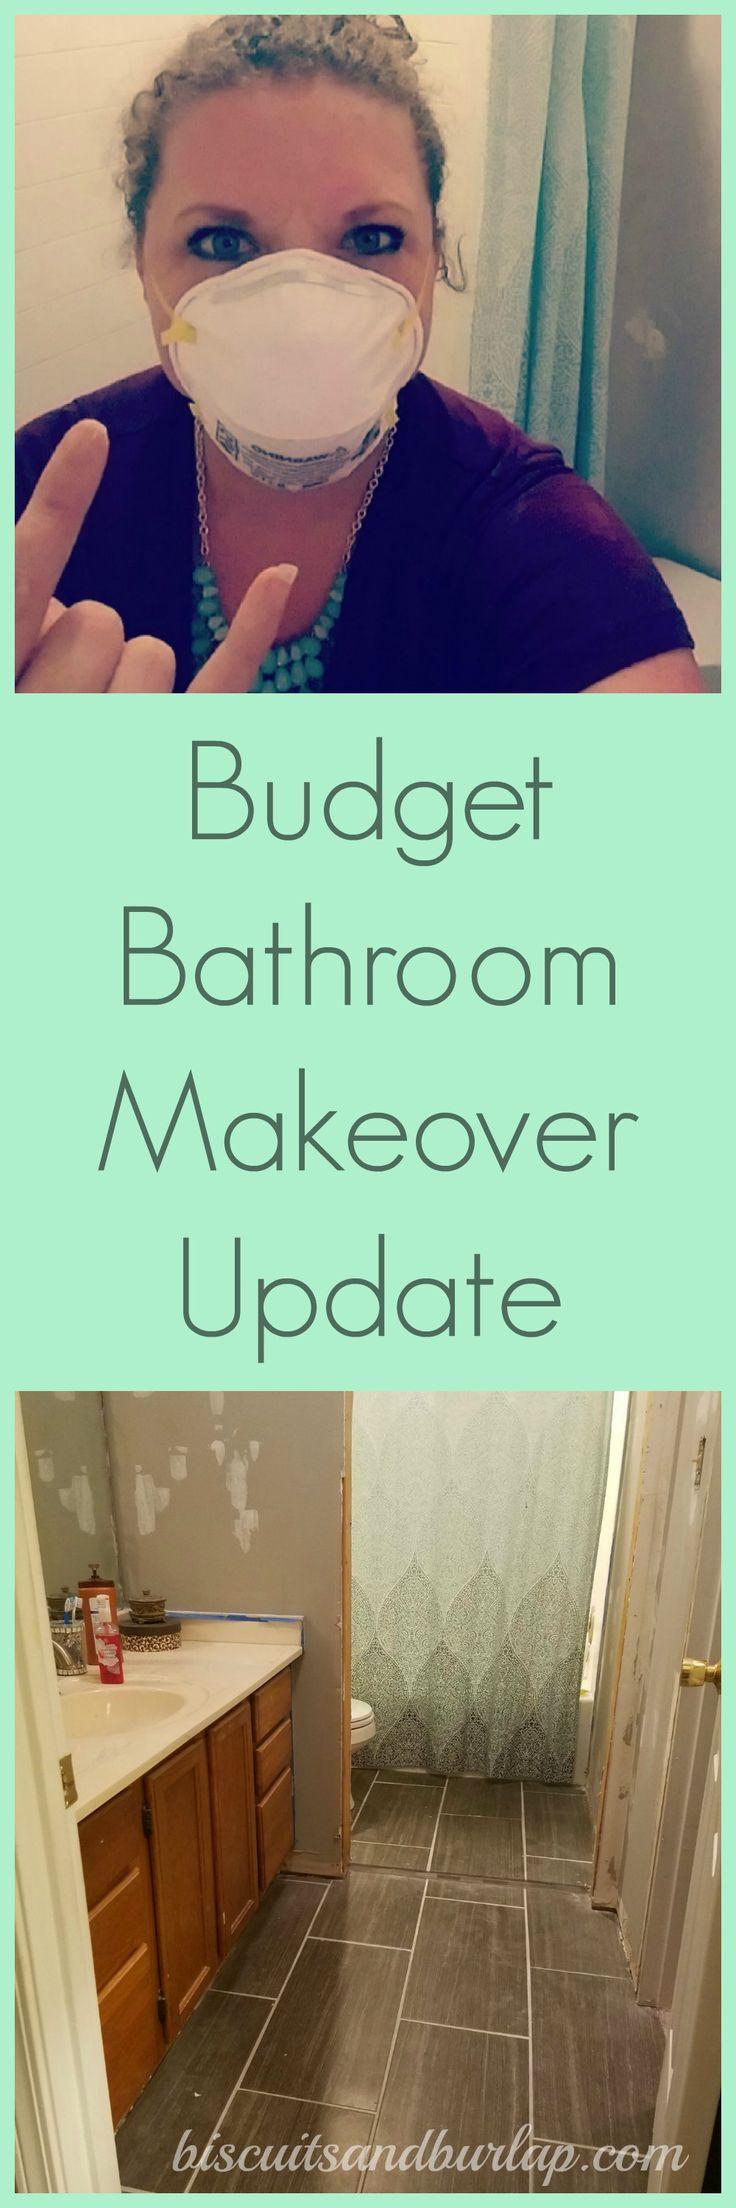 Best 25 Budget Bathroom Makeovers Ideas On Pinterest Diy Bathroom Furniture Diy Projects